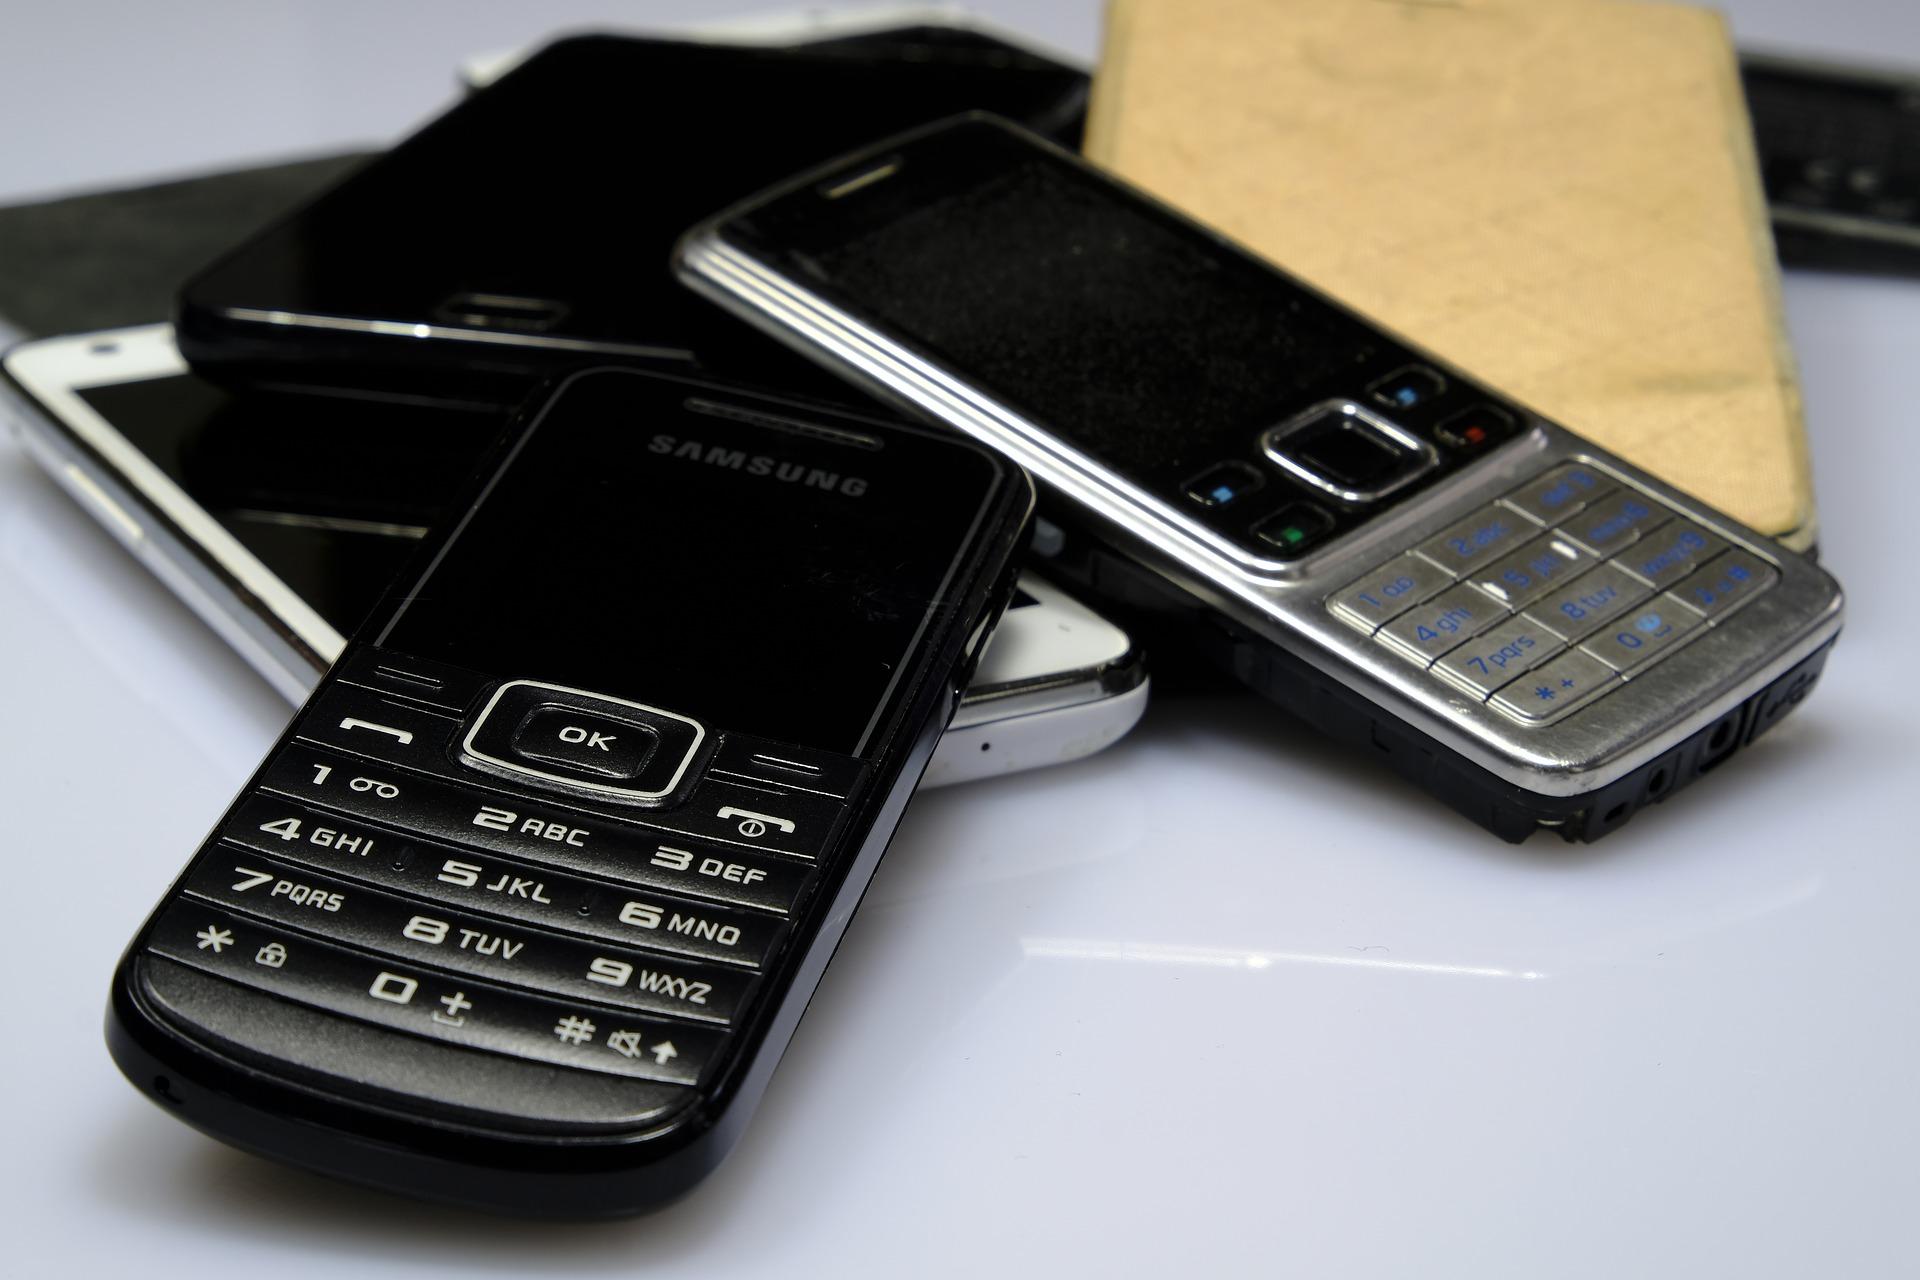 stare telefony na blacie